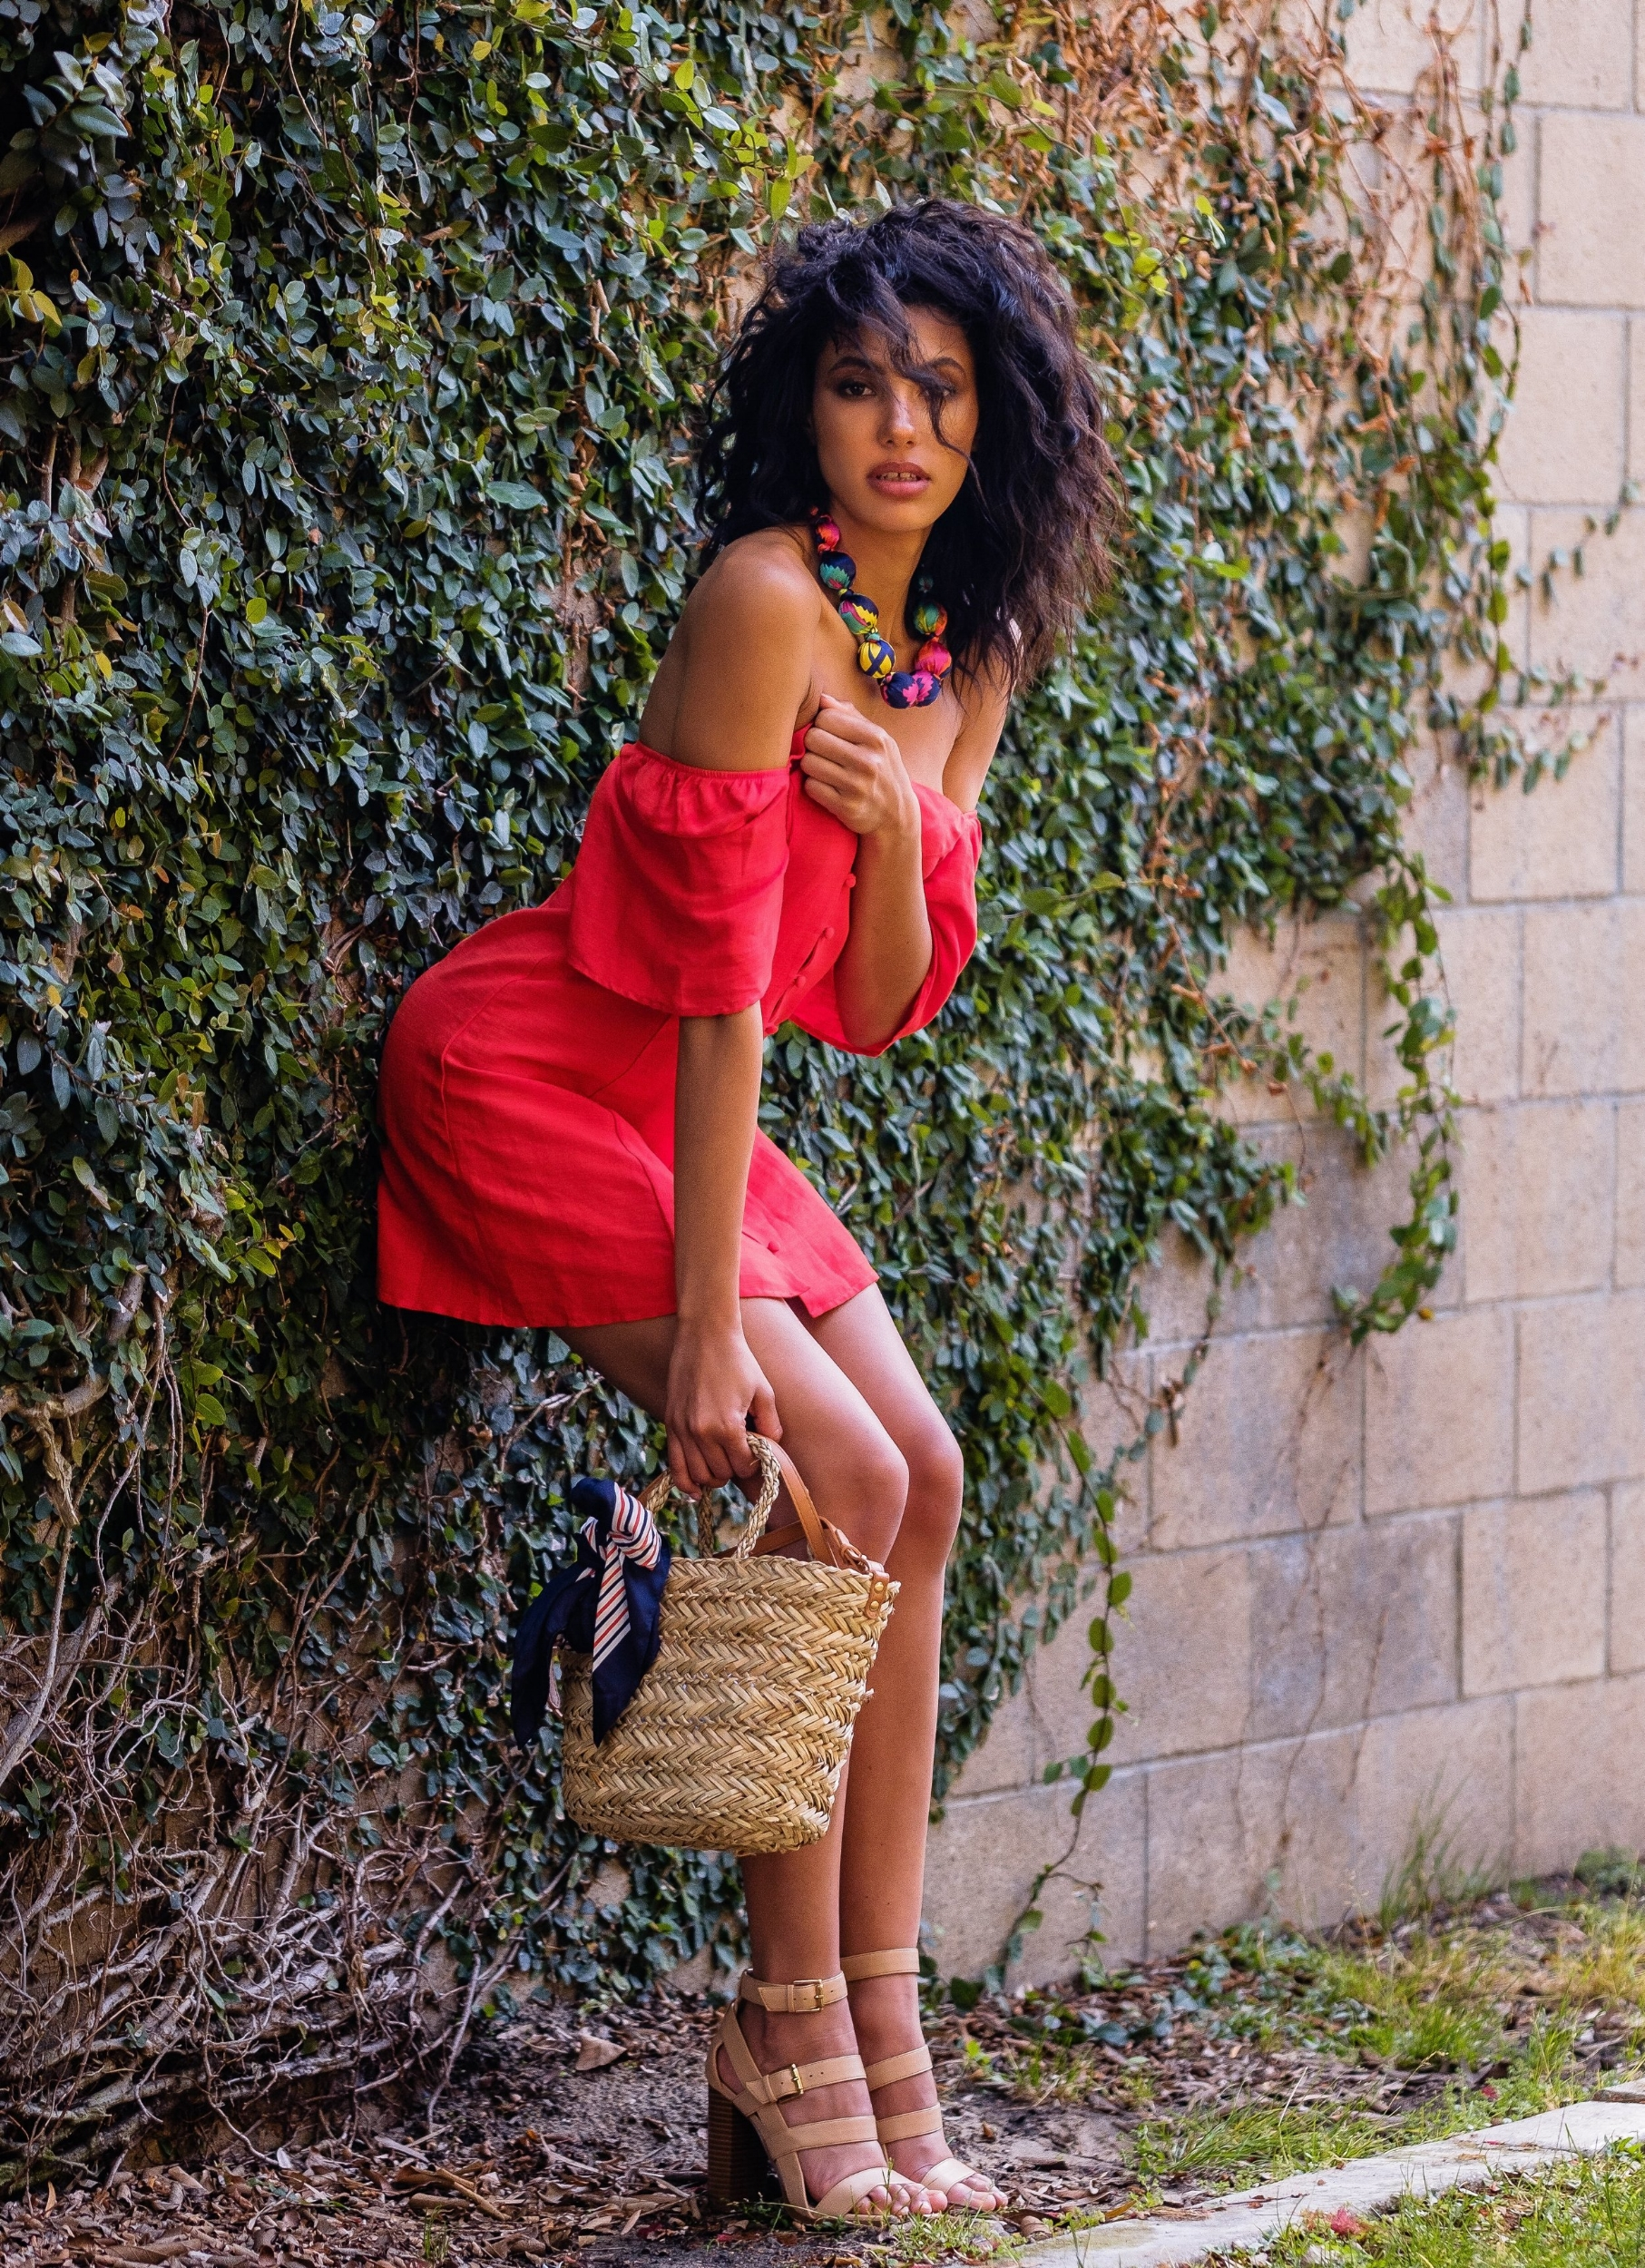 Tatiyanna Cotton LA Model